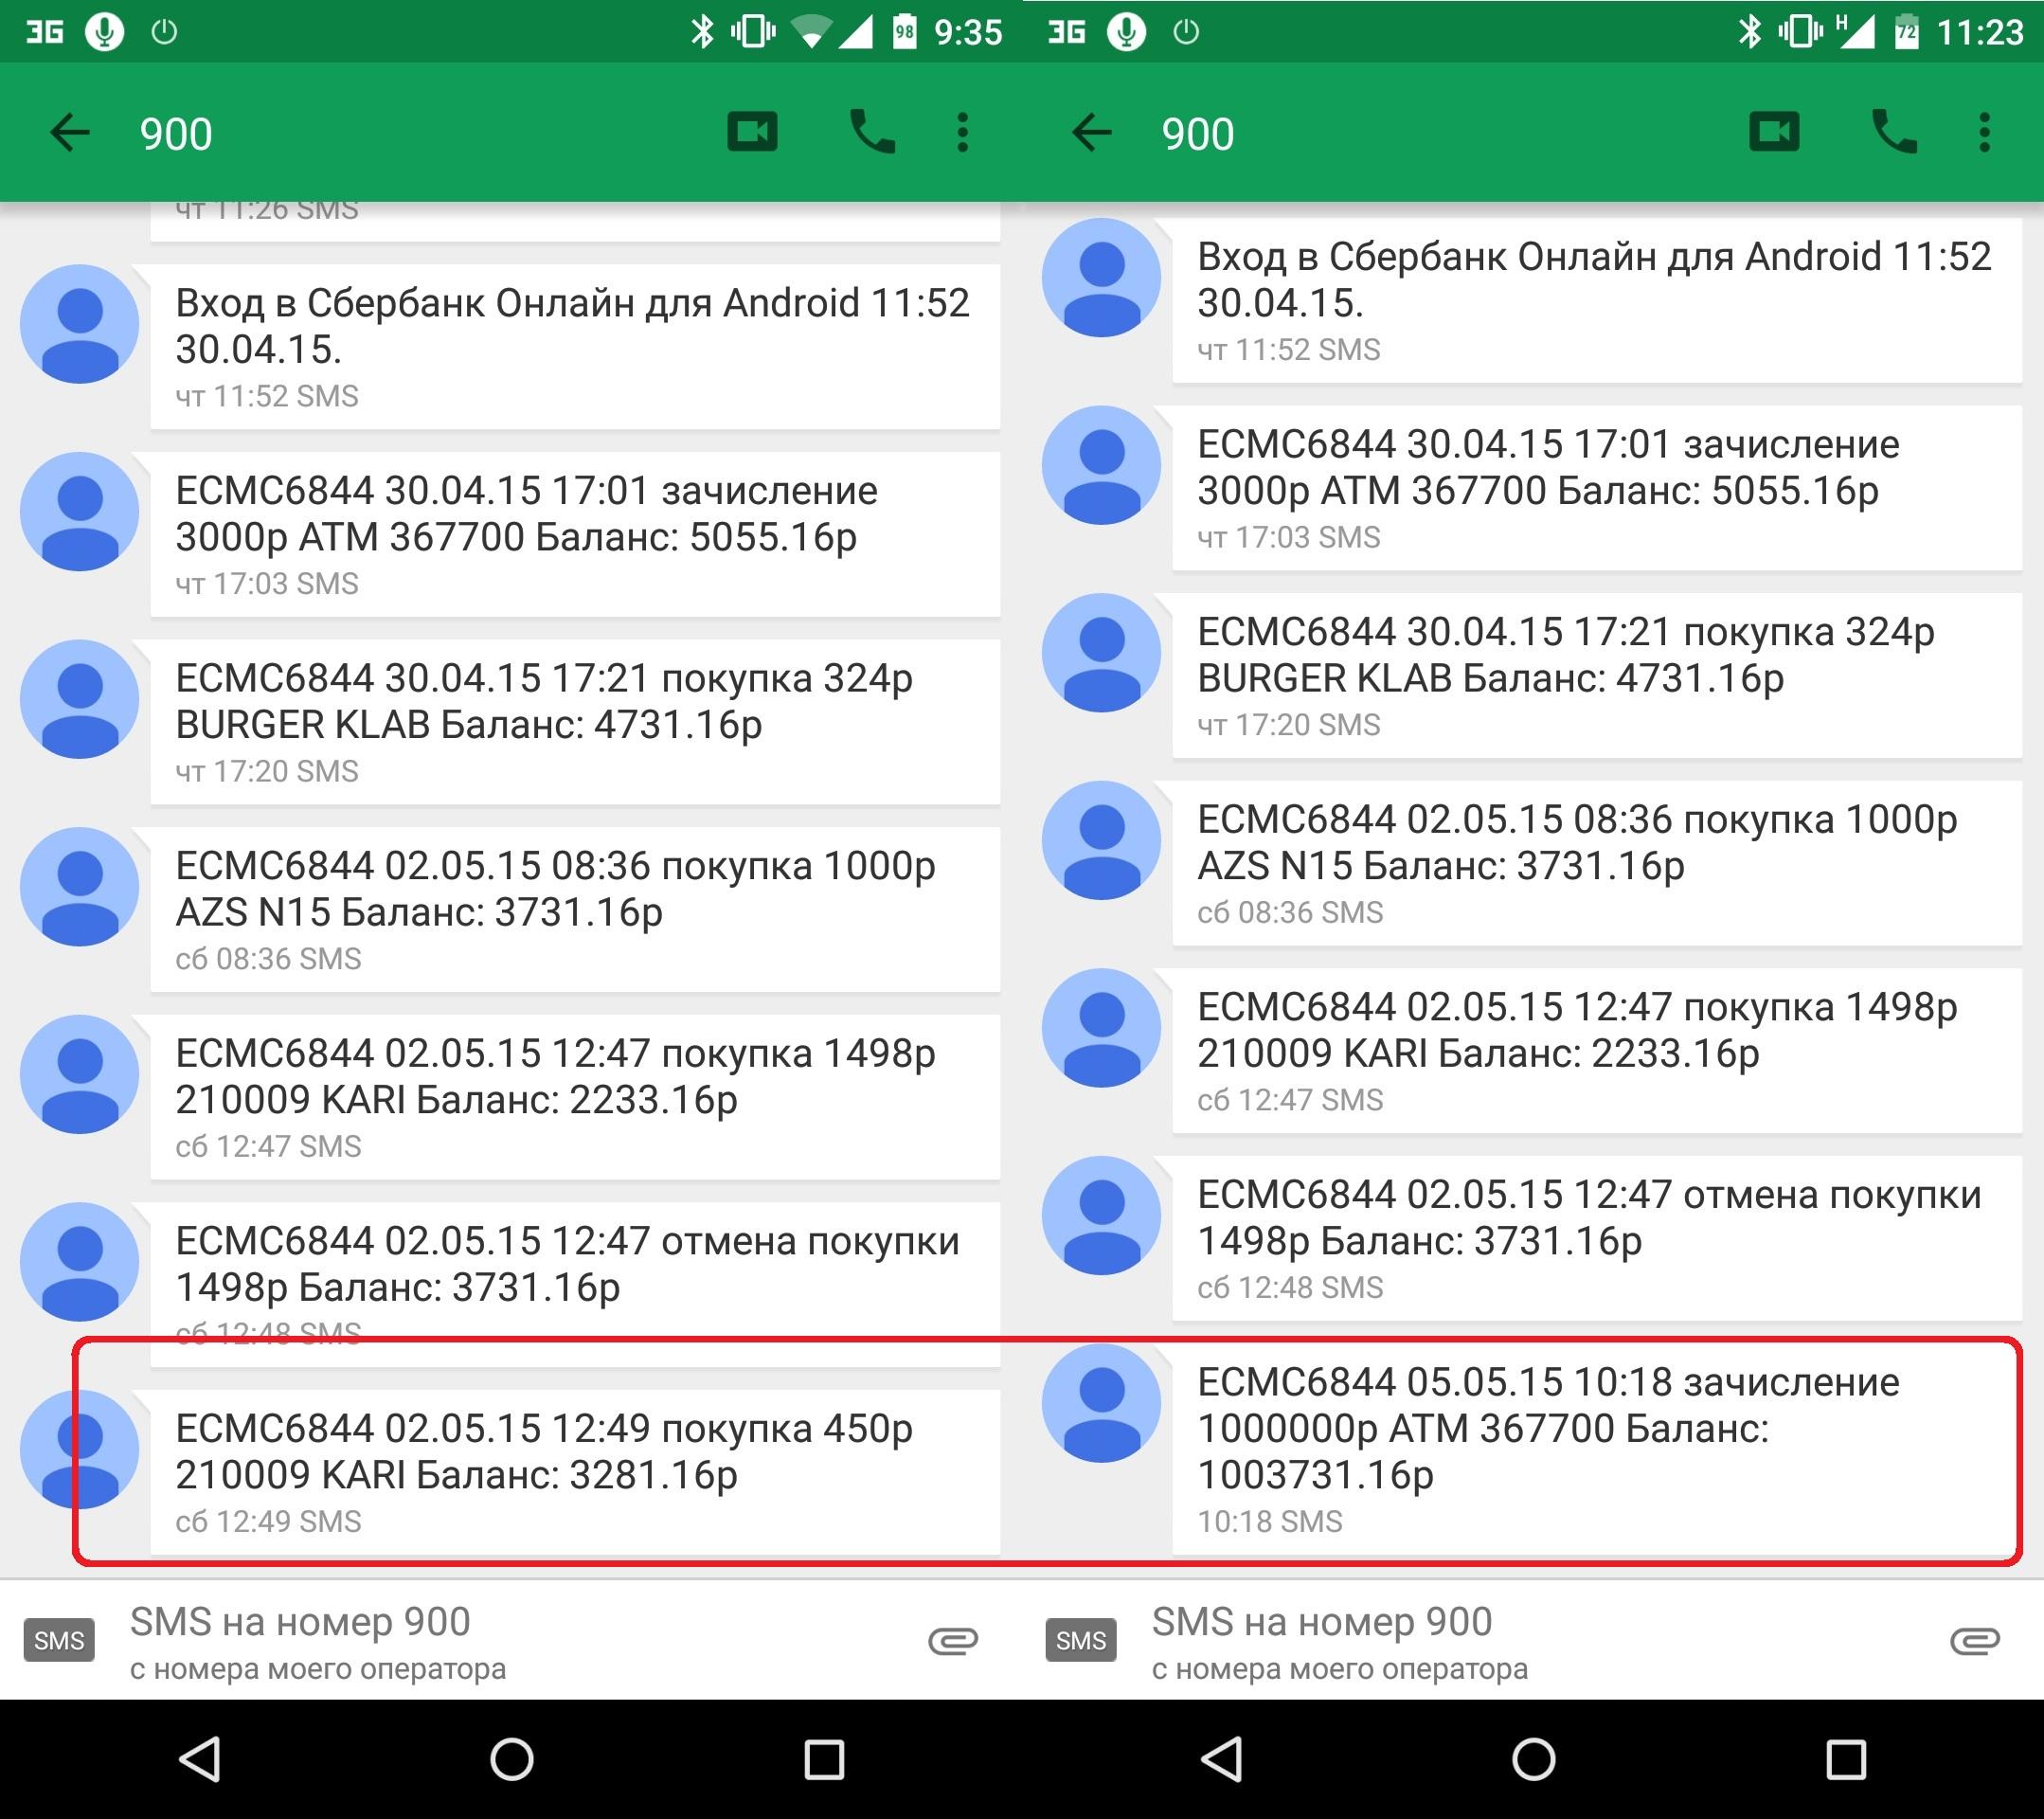 СМС от Сбербанка до и после вмешательства в mmssms.db